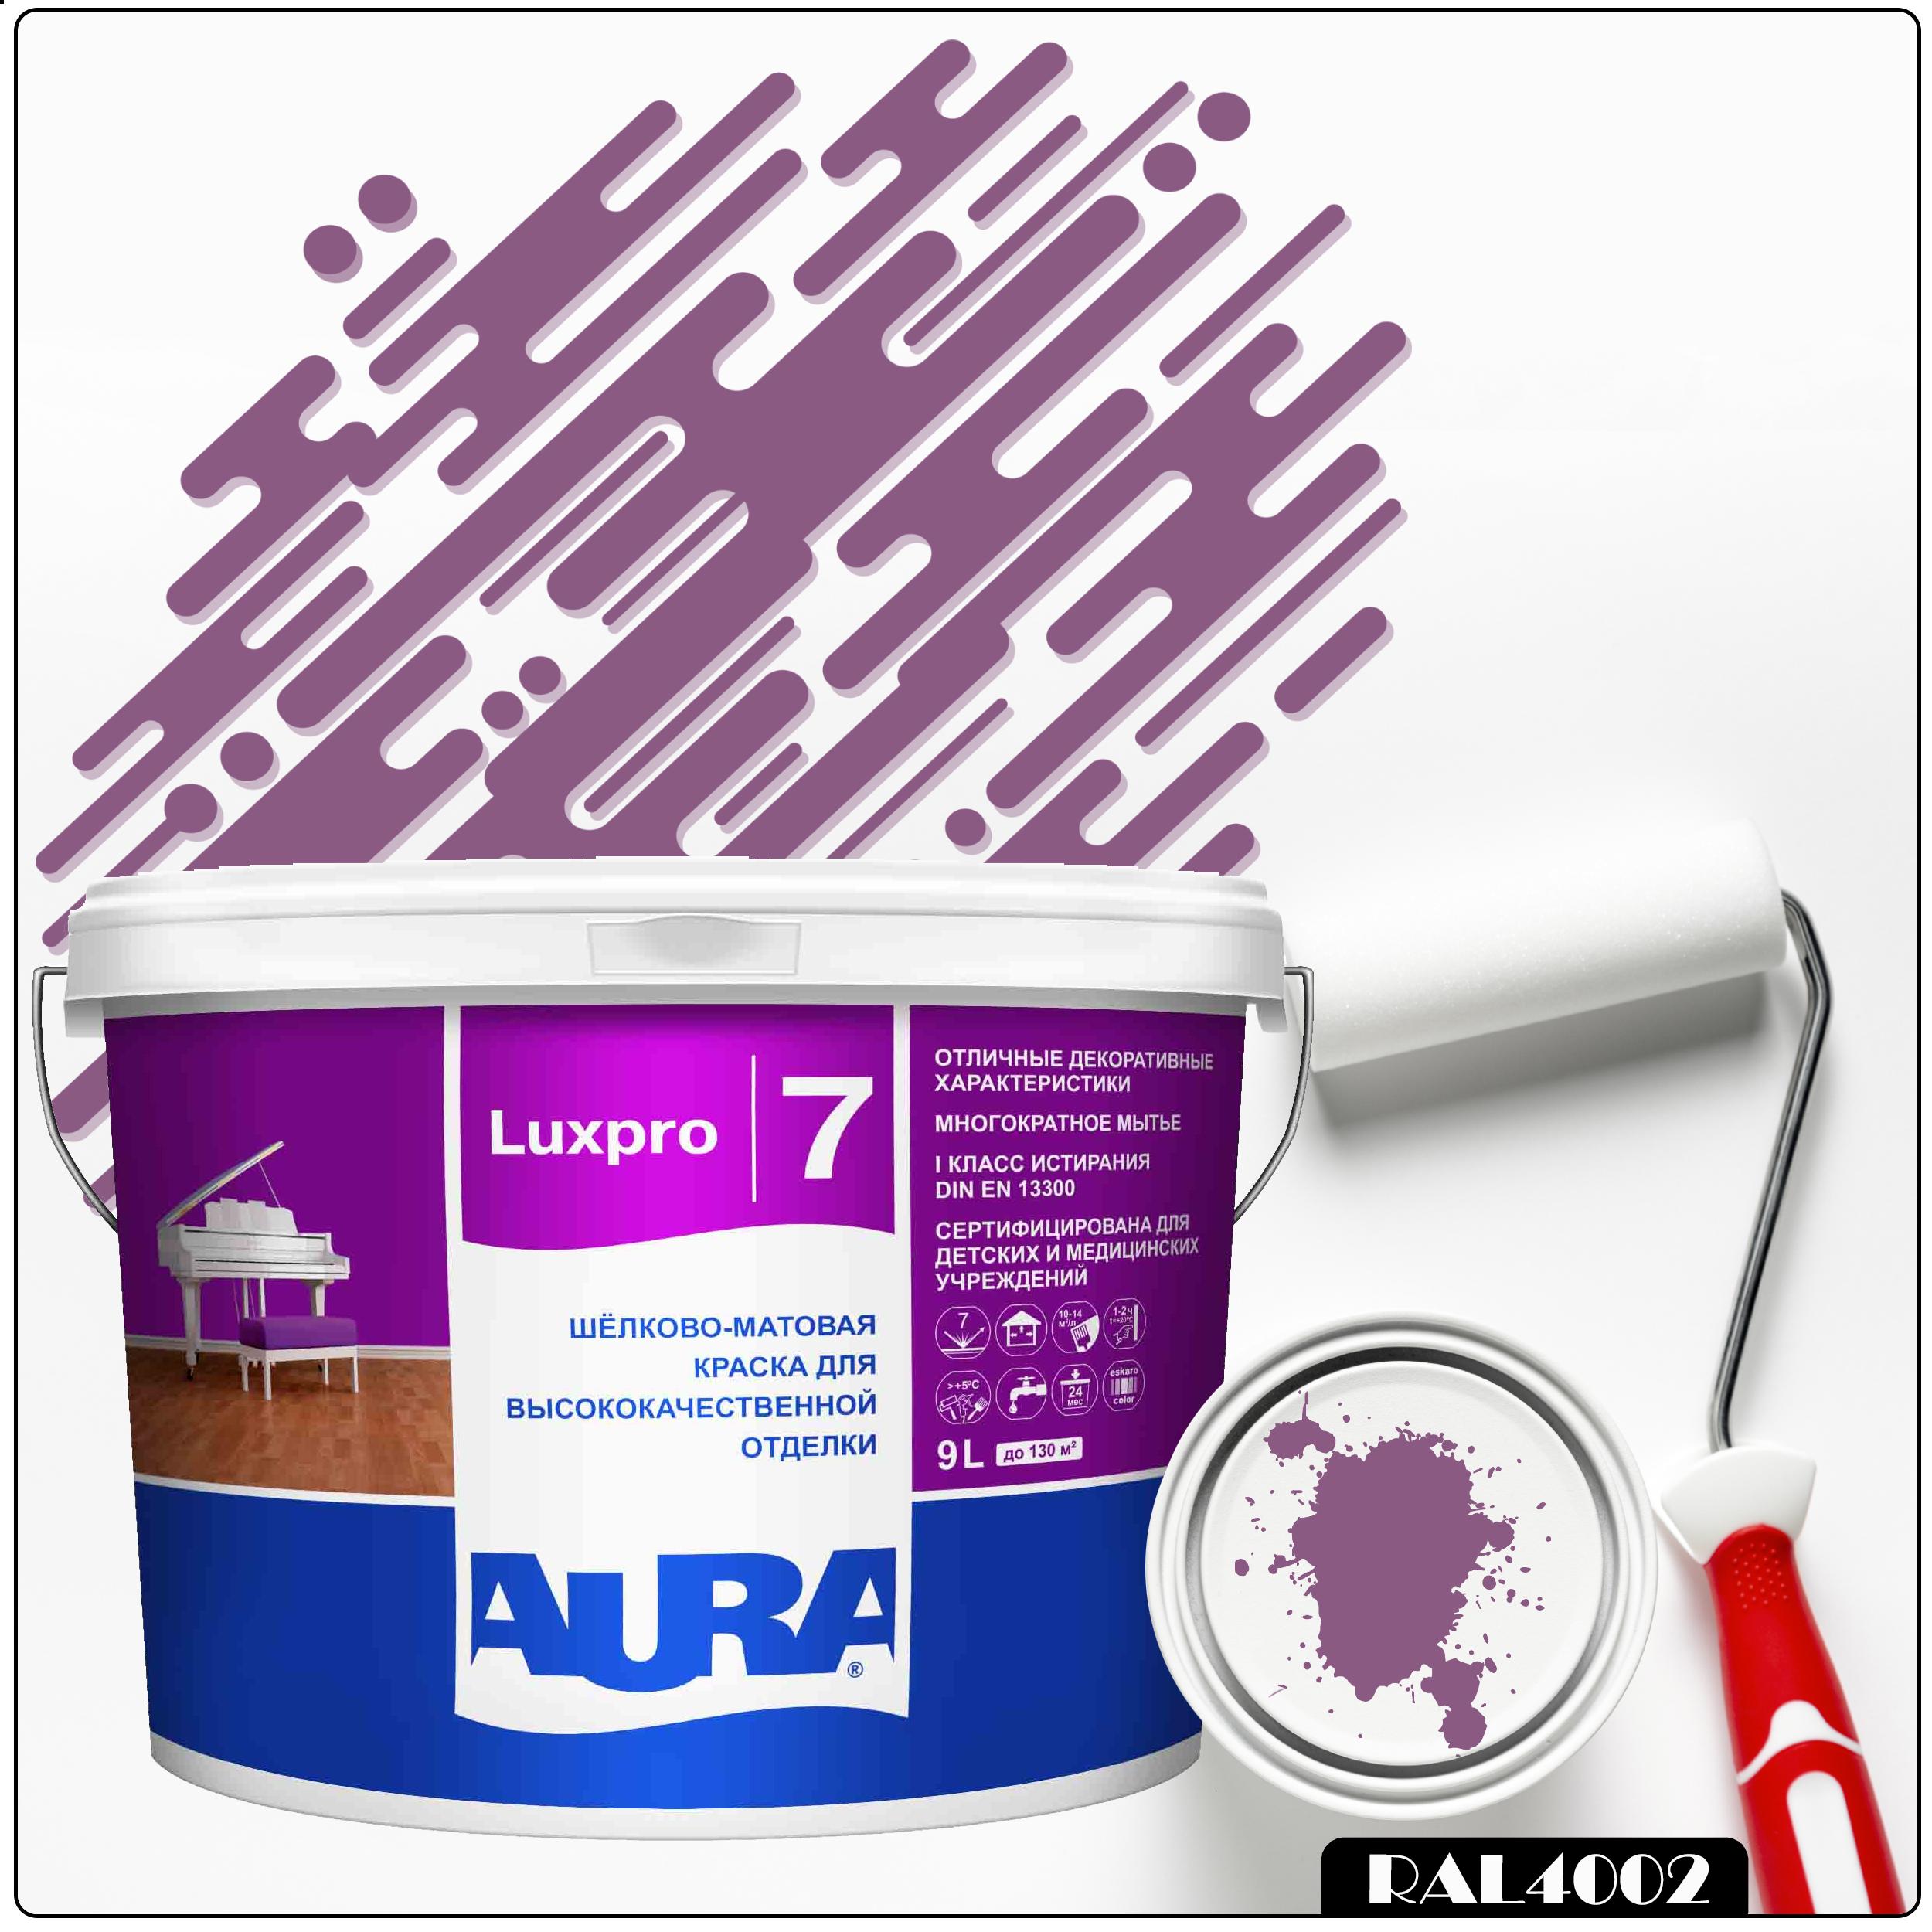 Фото 2 - Краска Aura LuxPRO 7, RAL 4002 Красно-фиолетовый, латексная, шелково-матовая, интерьерная, 9л, Аура.